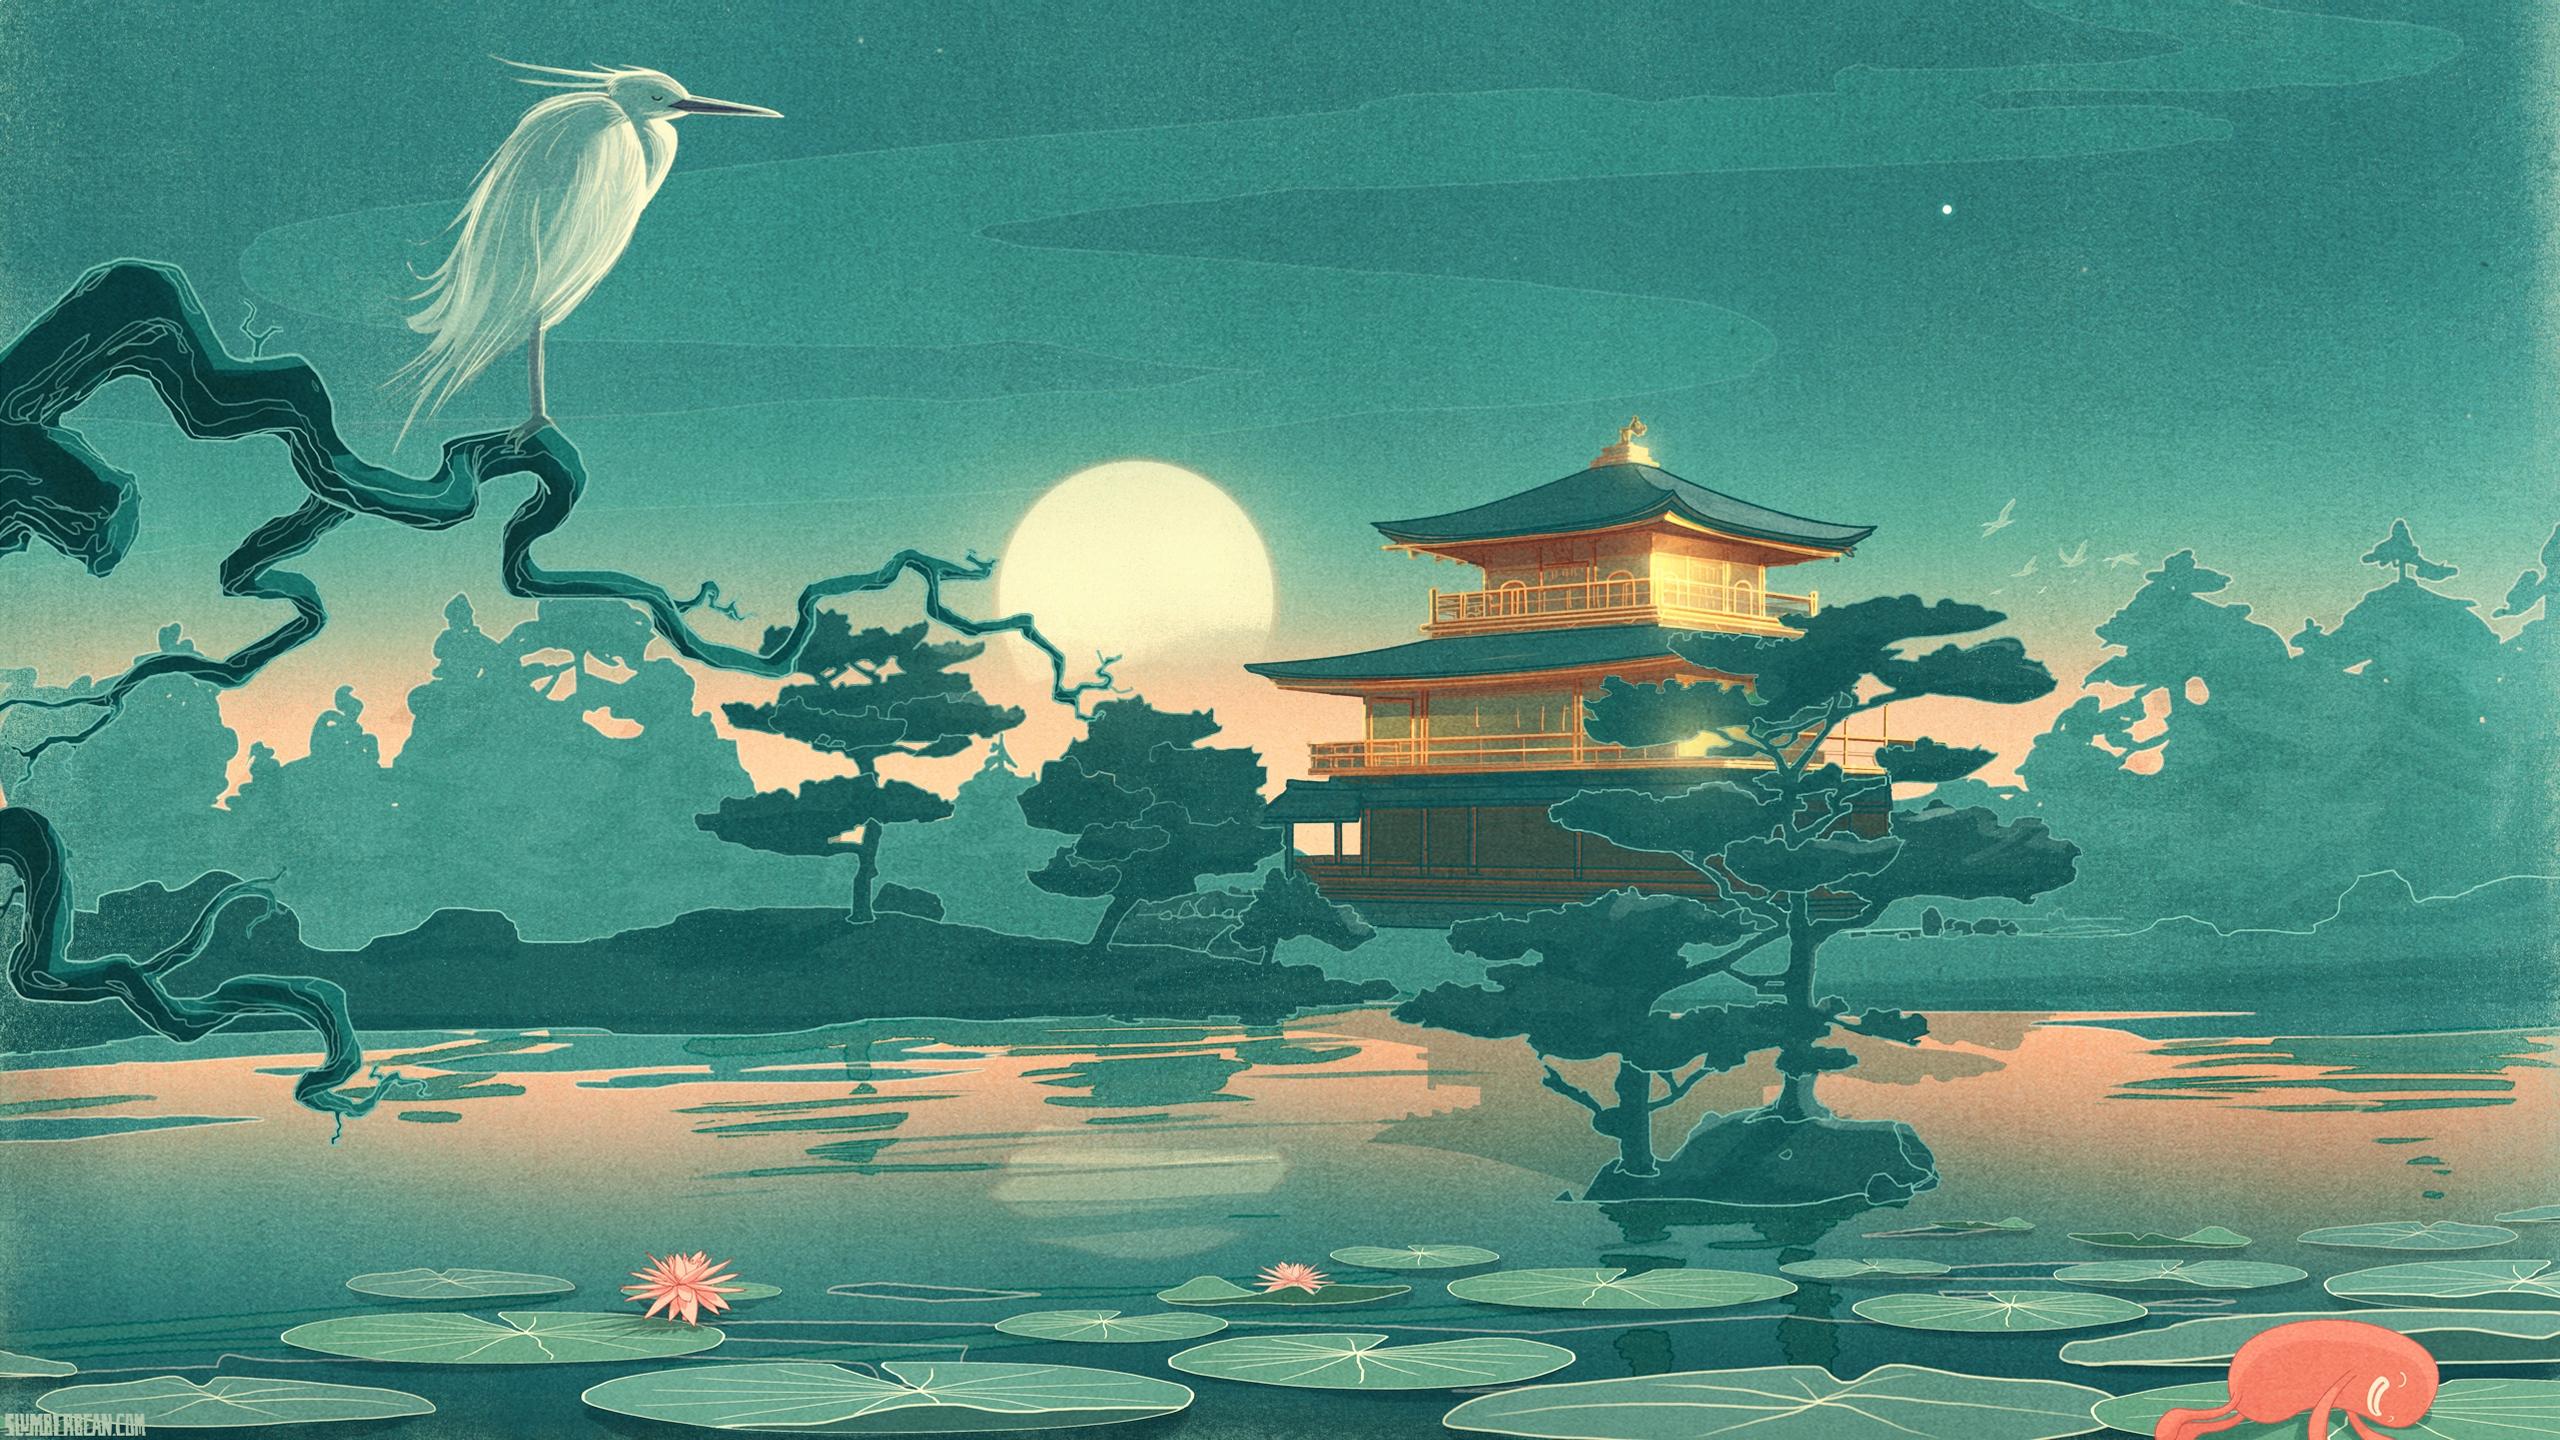 2560x1440 Wallpaper Heron, Lily, Trees, Temple, Moon, Drawing, Lake, Night